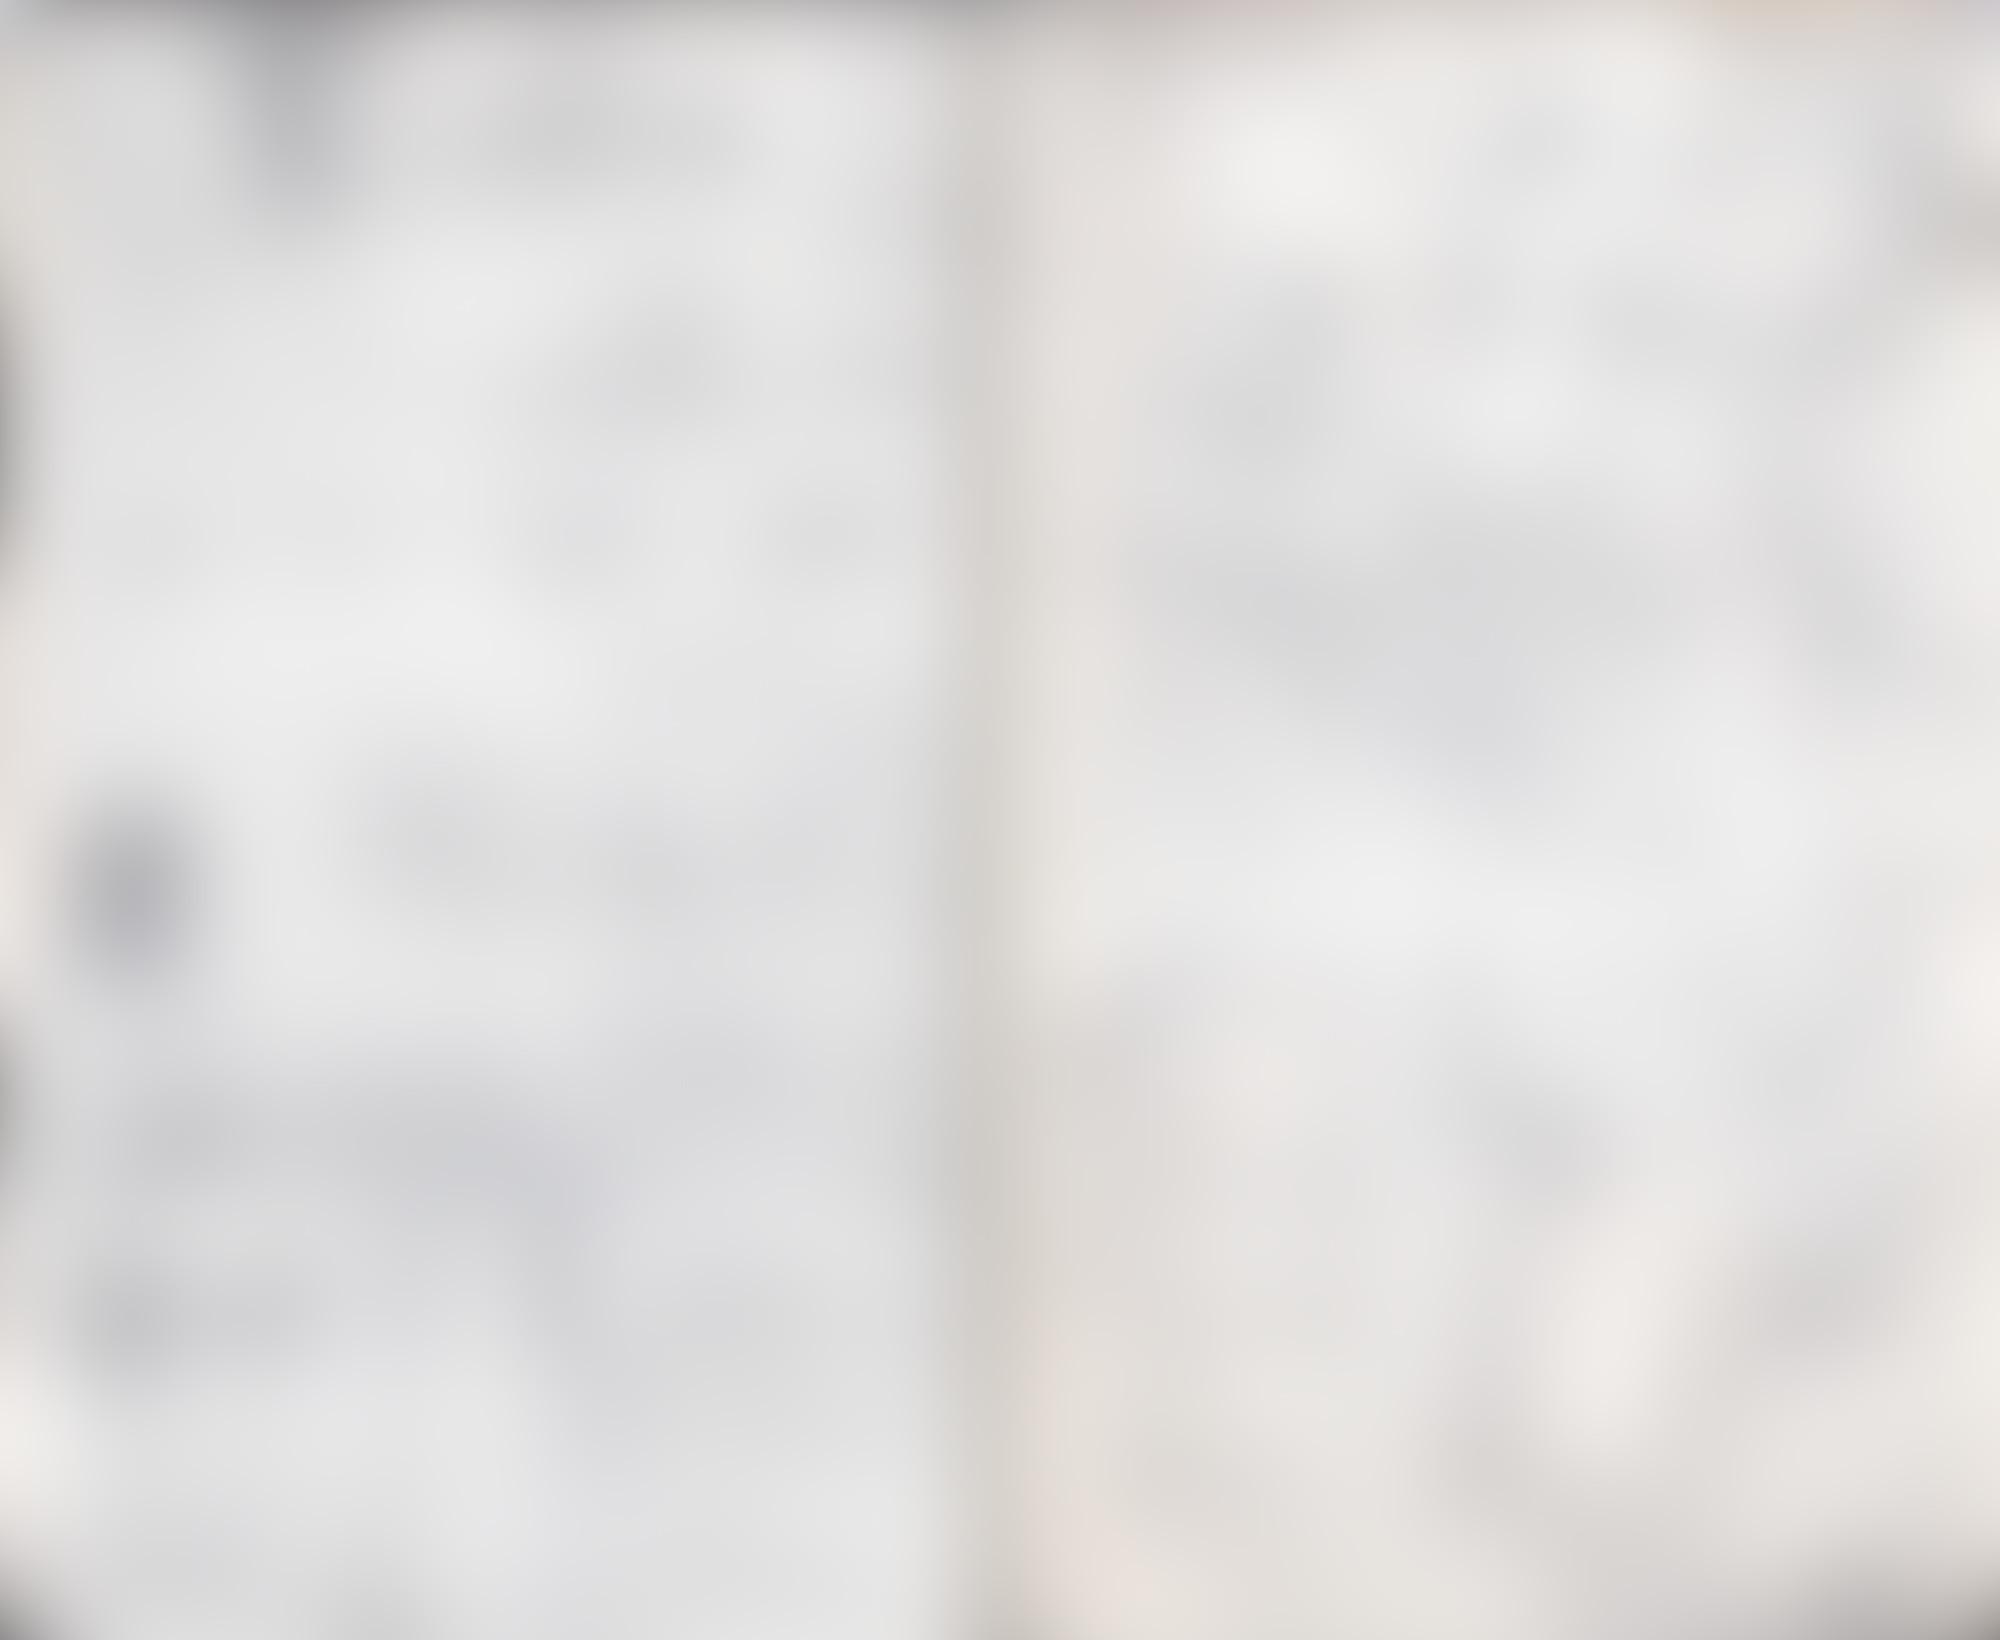 Sketchbook001 9 smaller autocompressfitresizeixlibphp 1 1 0max h2000max w3 D2000q80sb560b07e3cfd45240c6f516a127f41b2